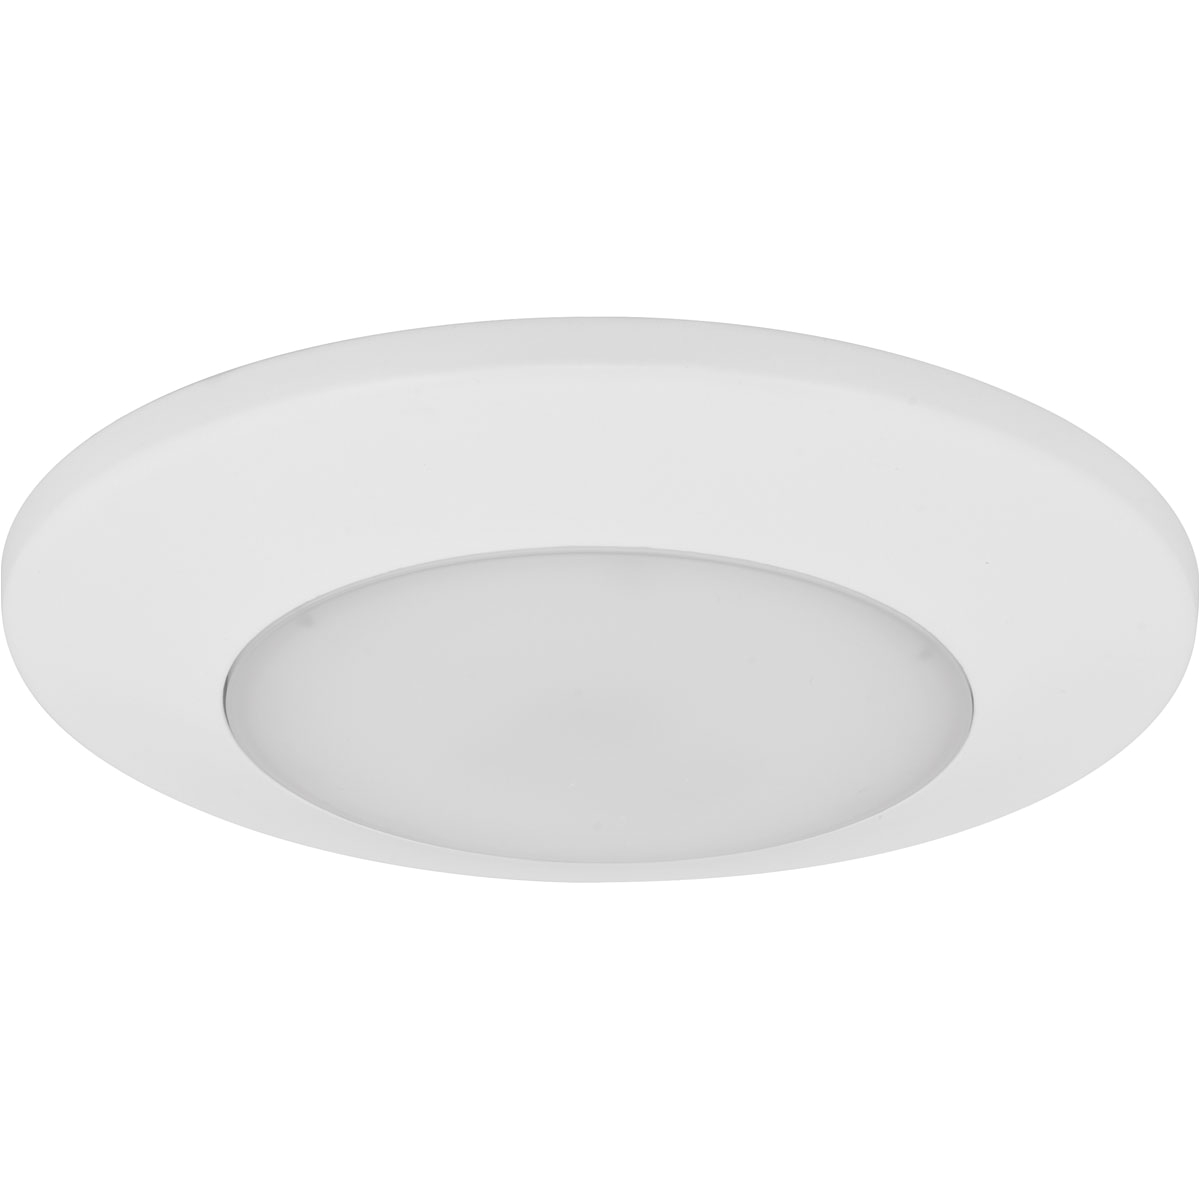 p82222830k9ac1l1 progress lighting